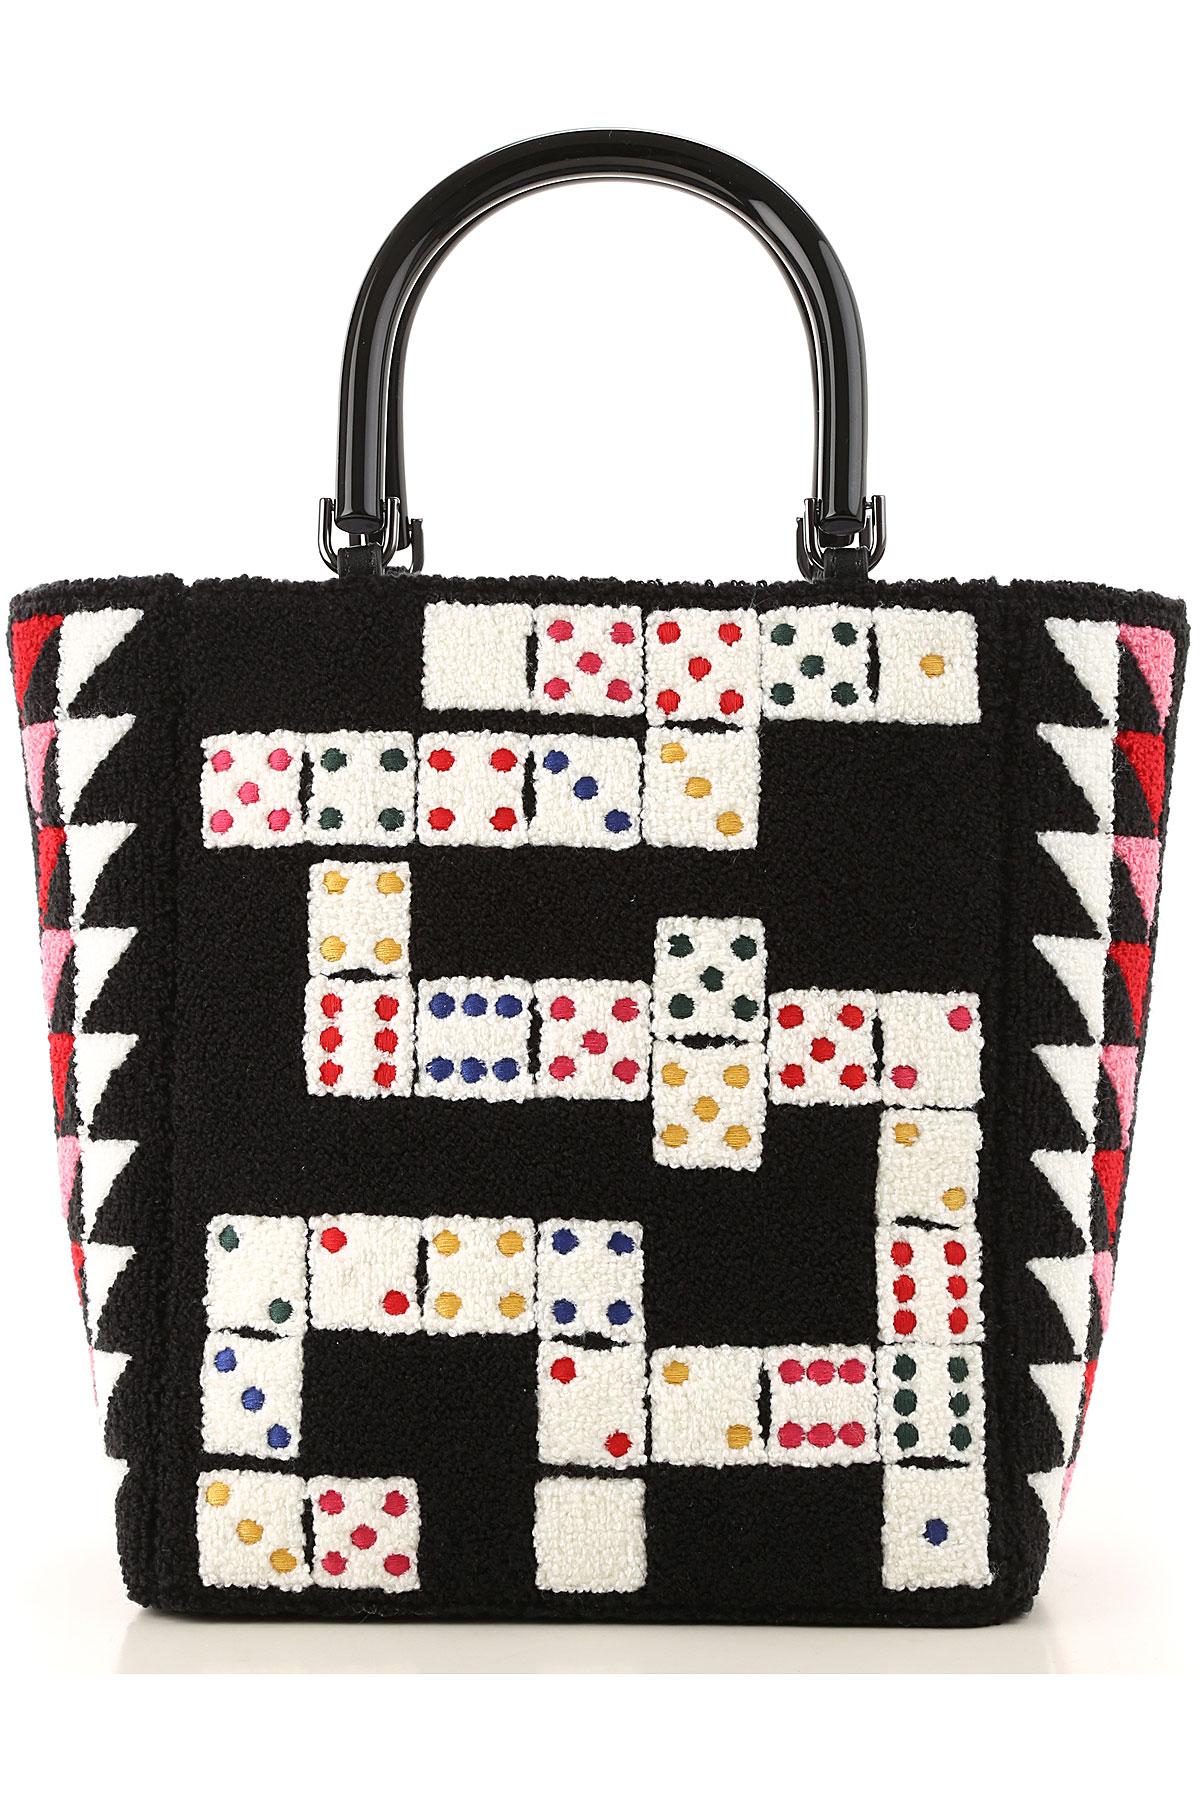 Lulu Guinness Top Handle Handbag On Sale, Black, Boucle, 2019